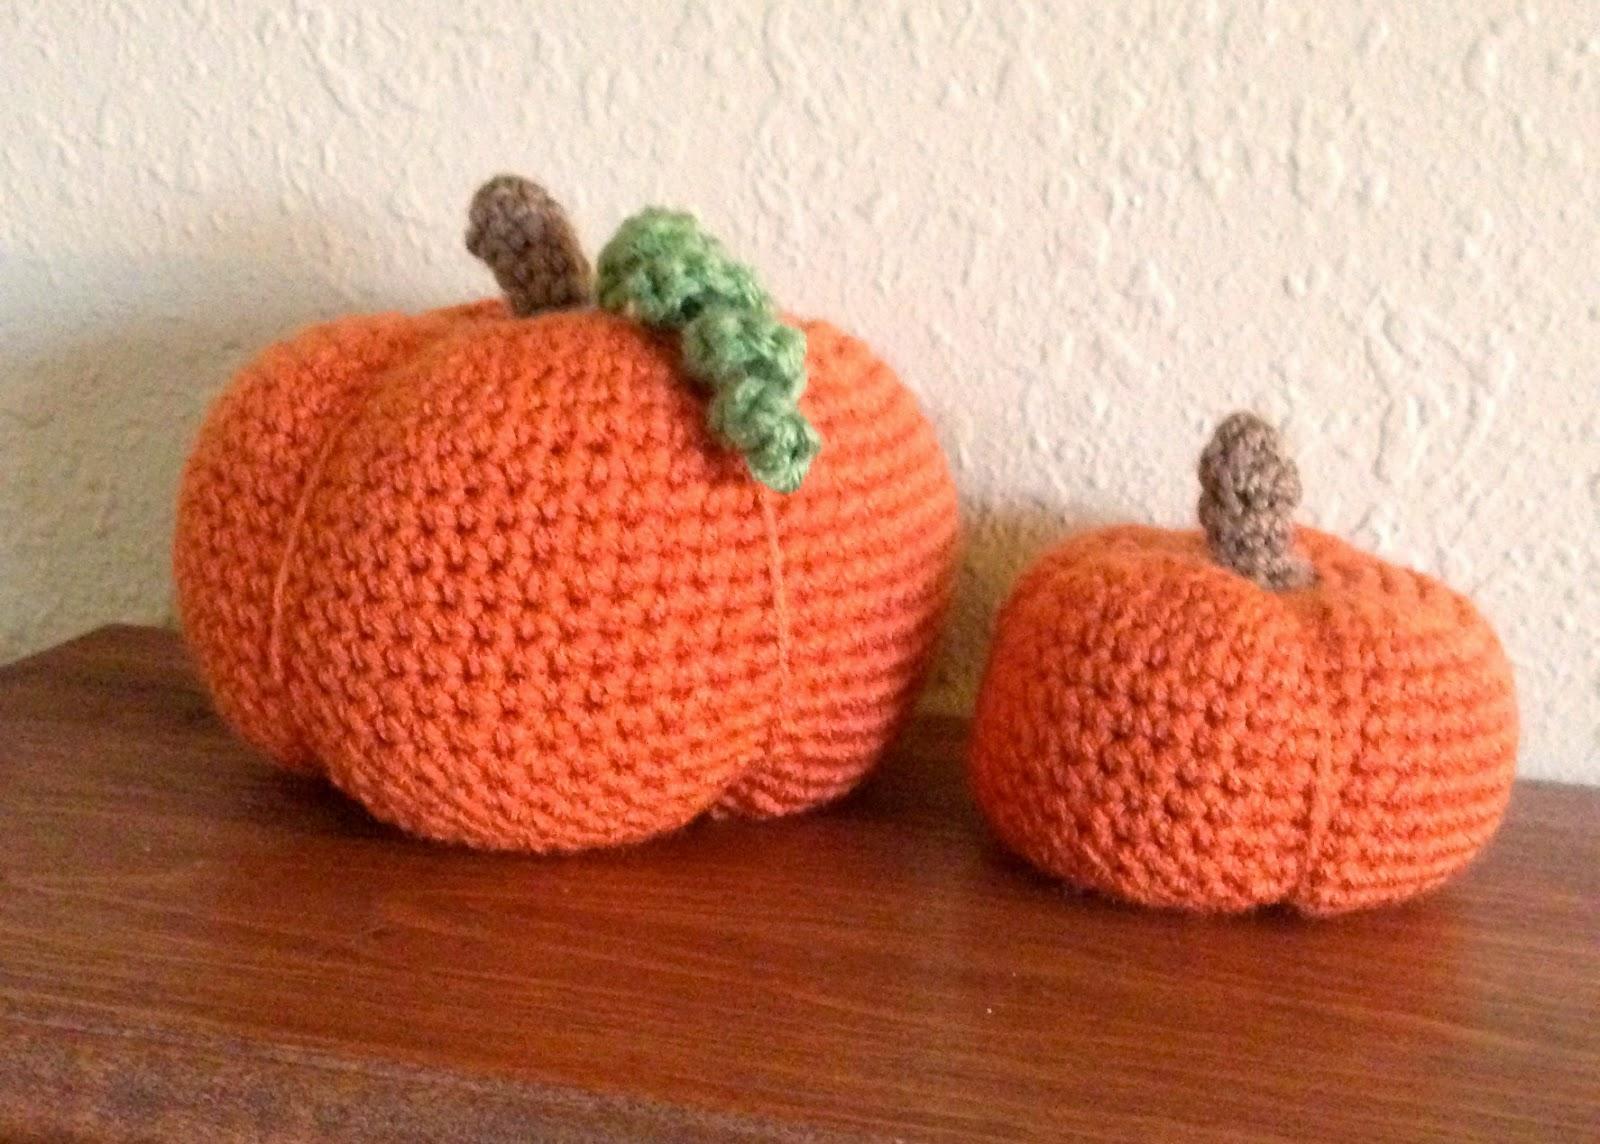 5 Little Monsters: Crocheted Pumpkins In Two Sizes: Free Pattern